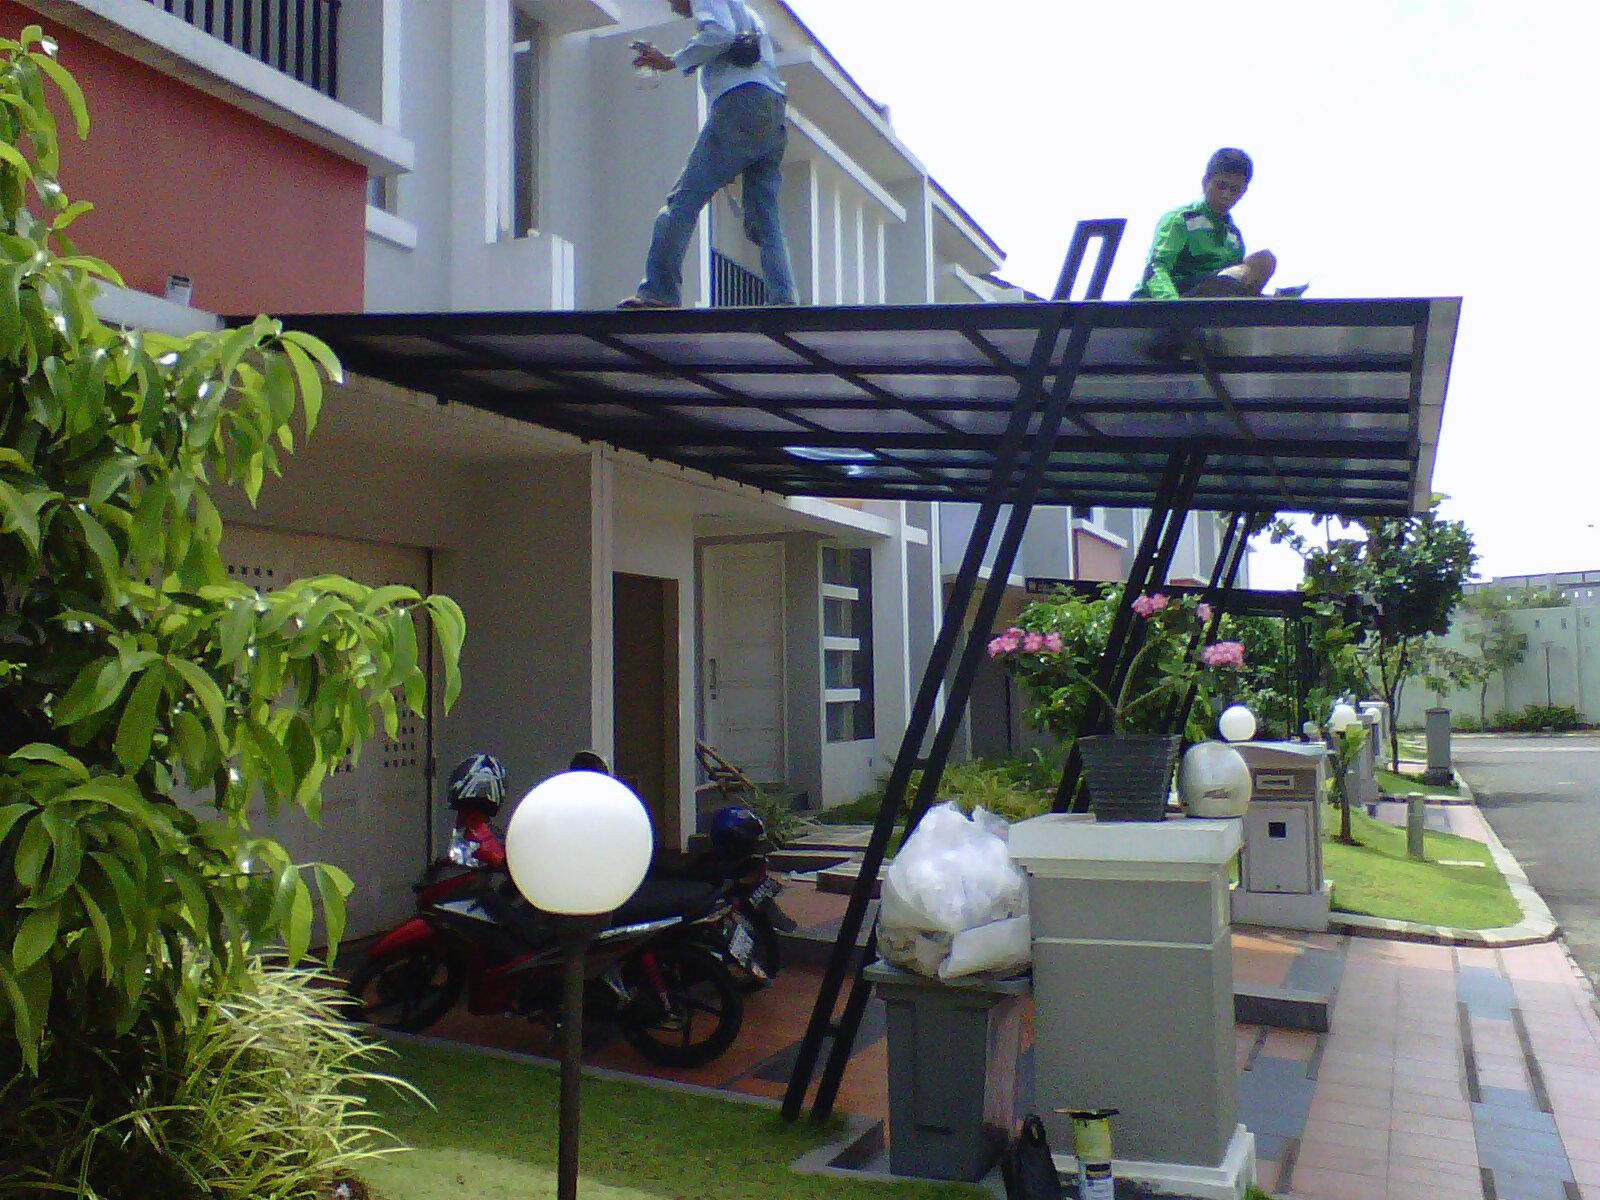 Contoh Atap Baja Ringan Rumah Minimalis Canopy Carport,kanopi: Gambar Kanopy,kanopi,canopy Carport ...